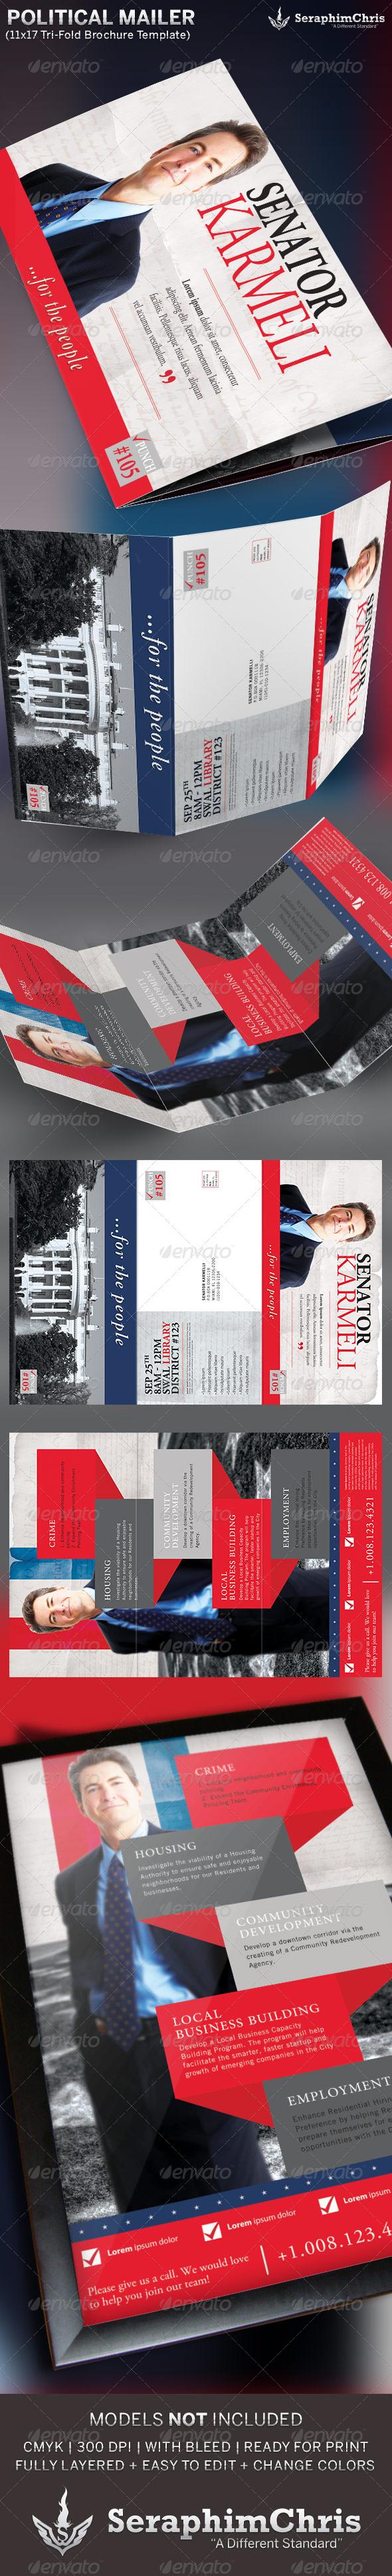 GraphicRiver Large Political Tri-Fold Brochure Mailer Template 5424541